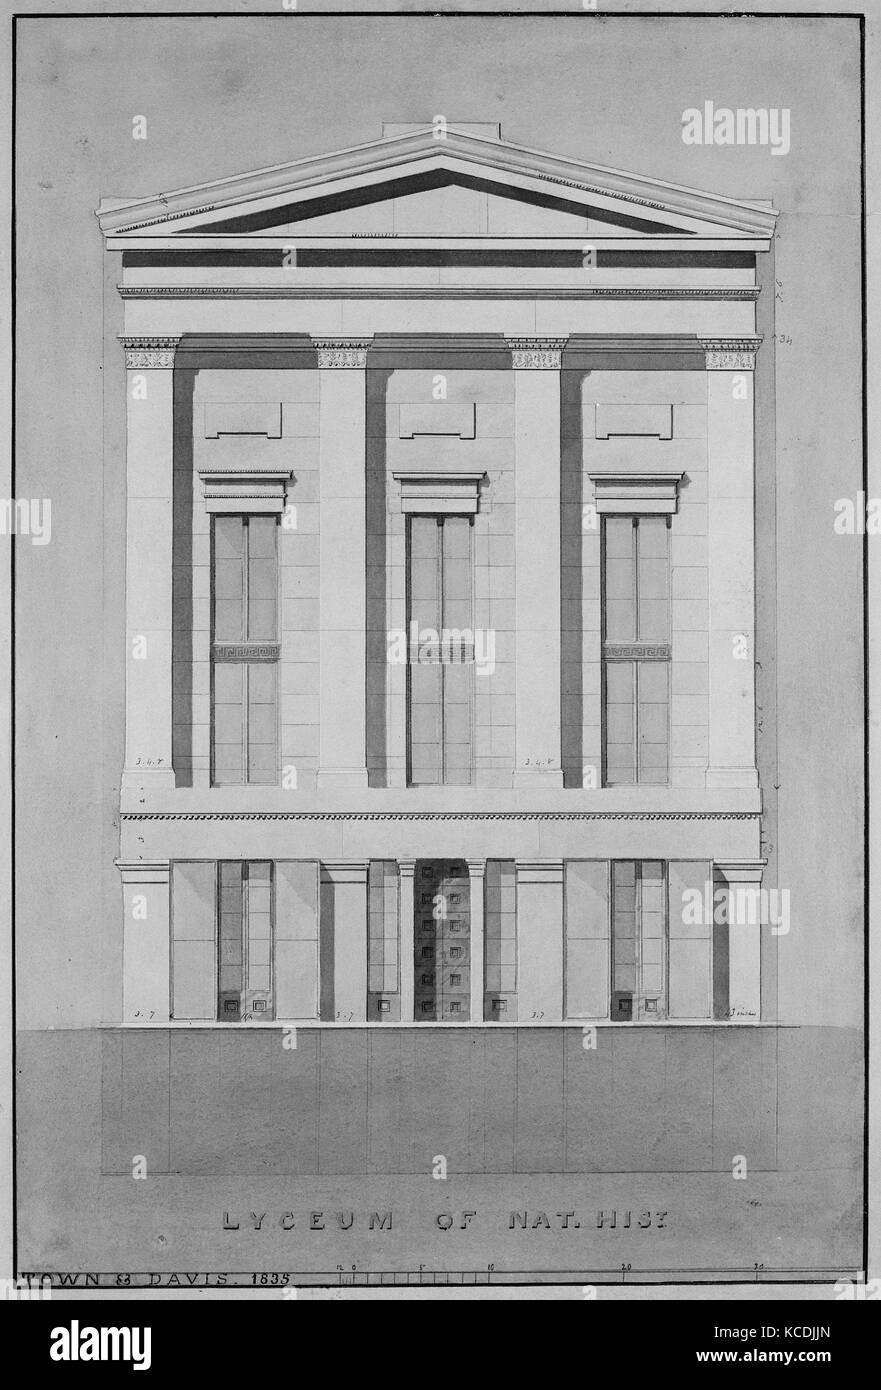 Lyceum of Natural History, New York (front elevation), Alexander Jackson Davis, 1835 - Stock Image